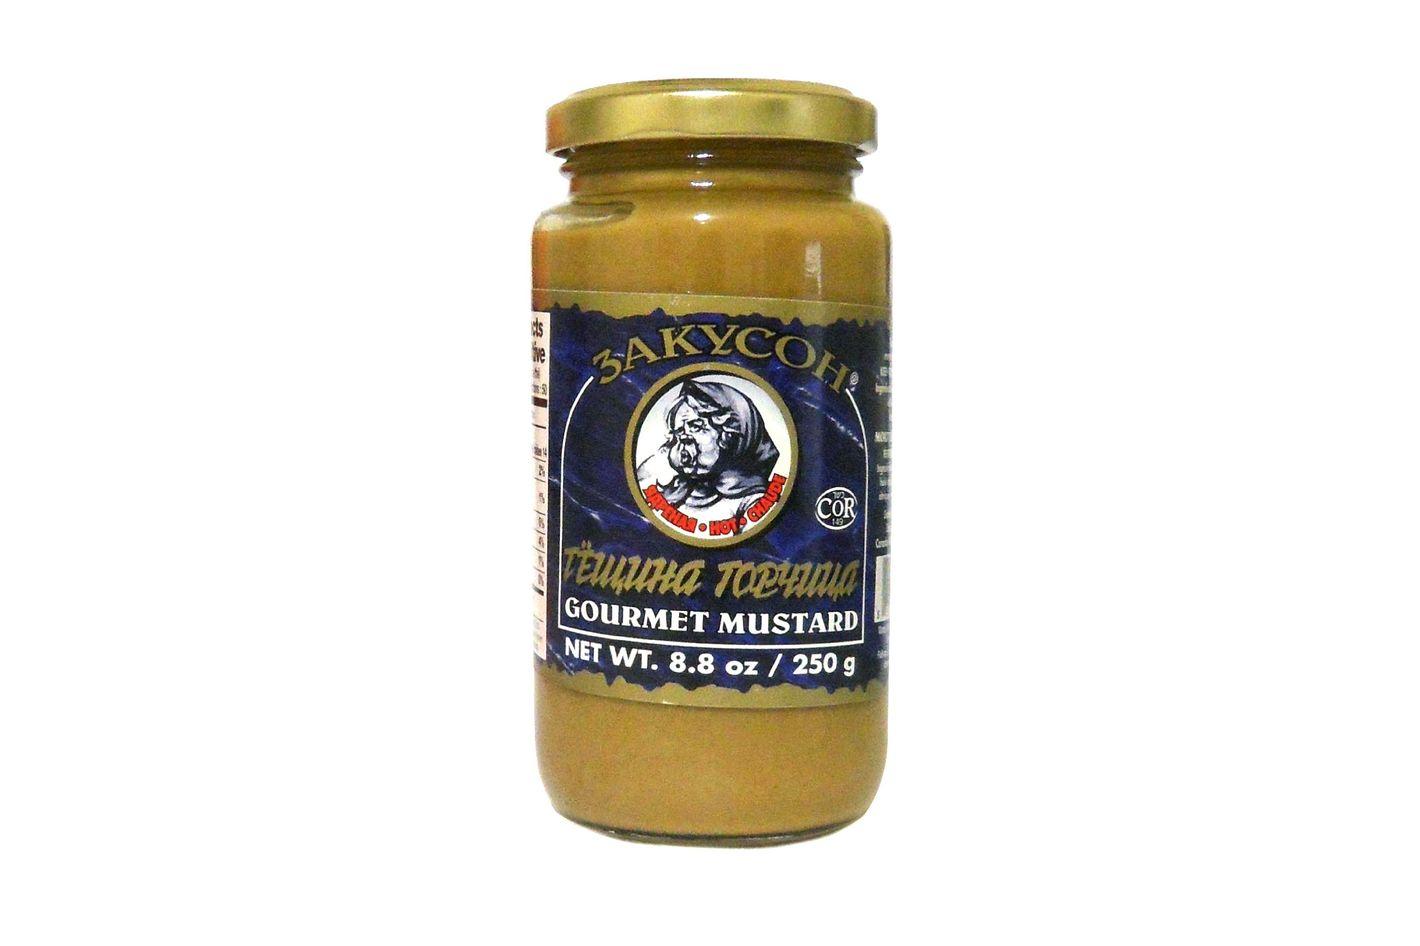 Zakuson Gourmet Mustard